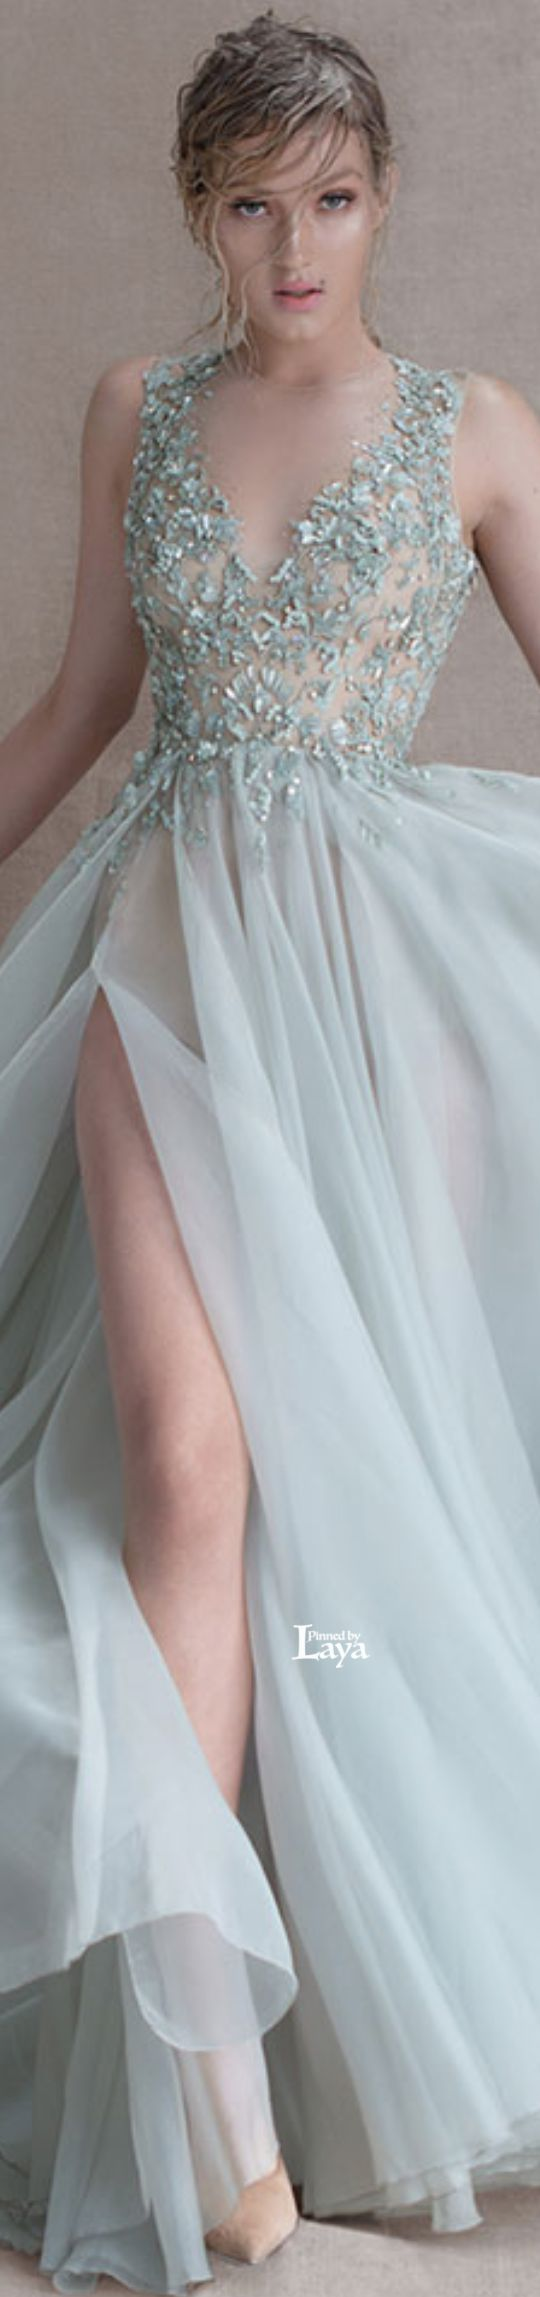 63 best Paolo Sebastian images on Pinterest   Cute dresses, High ...